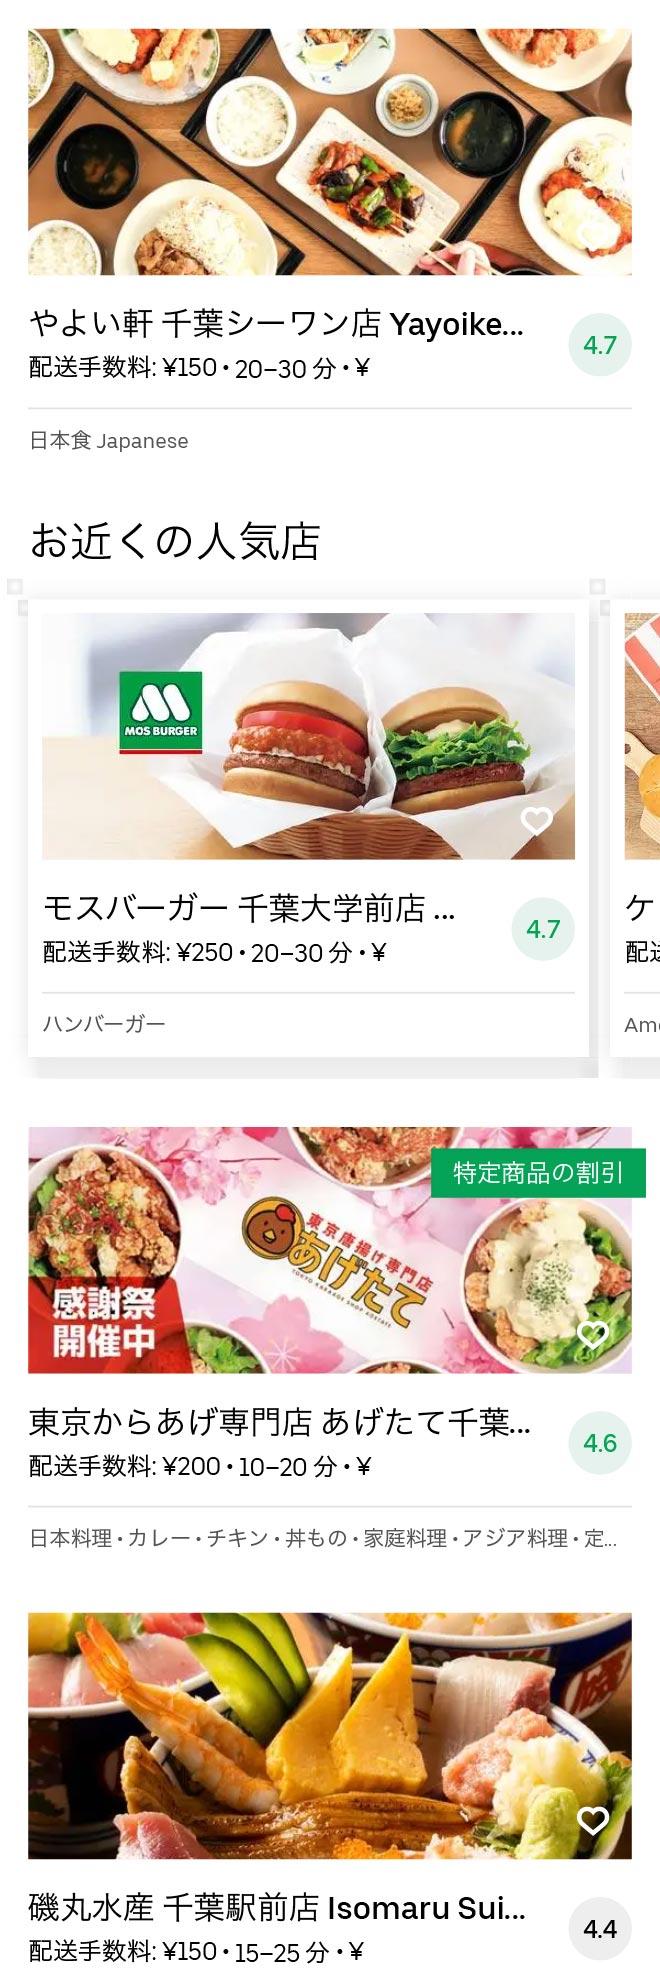 Chiba menu 2010 02